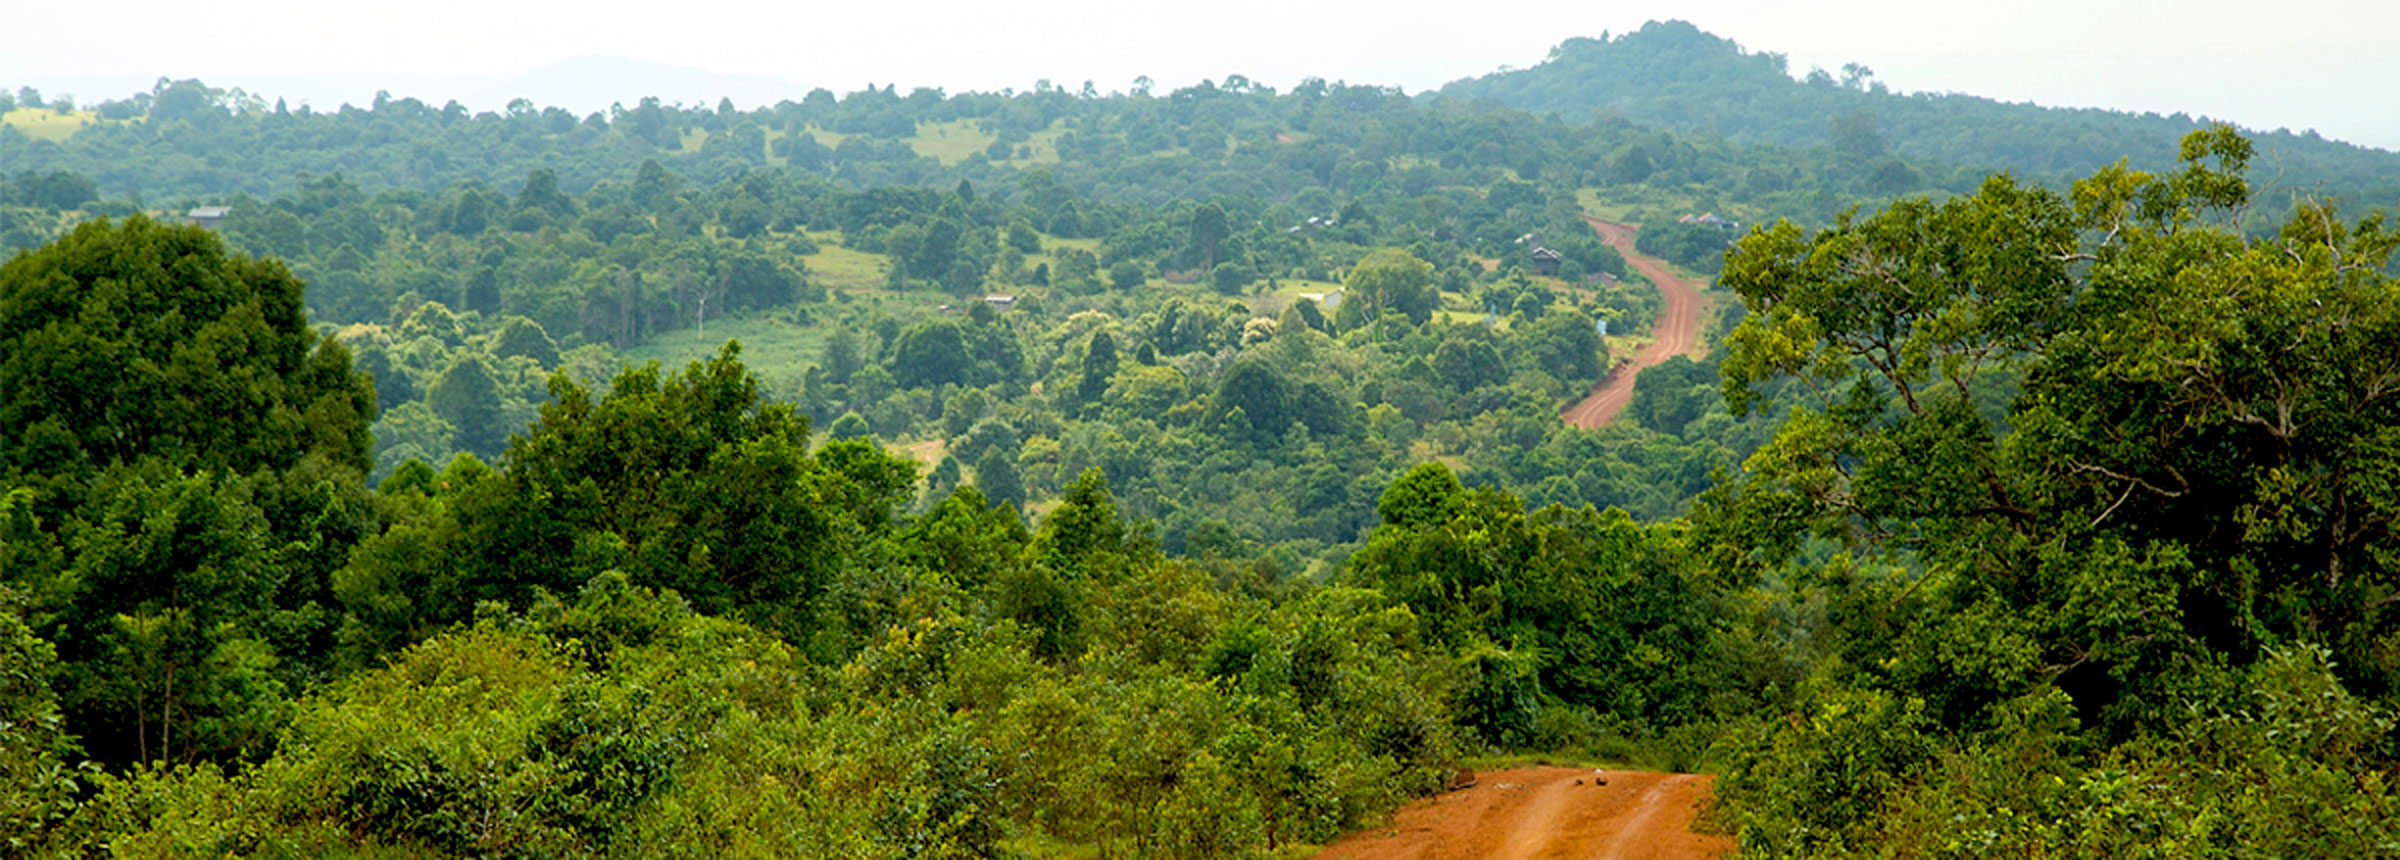 Road to Prey Lang Village